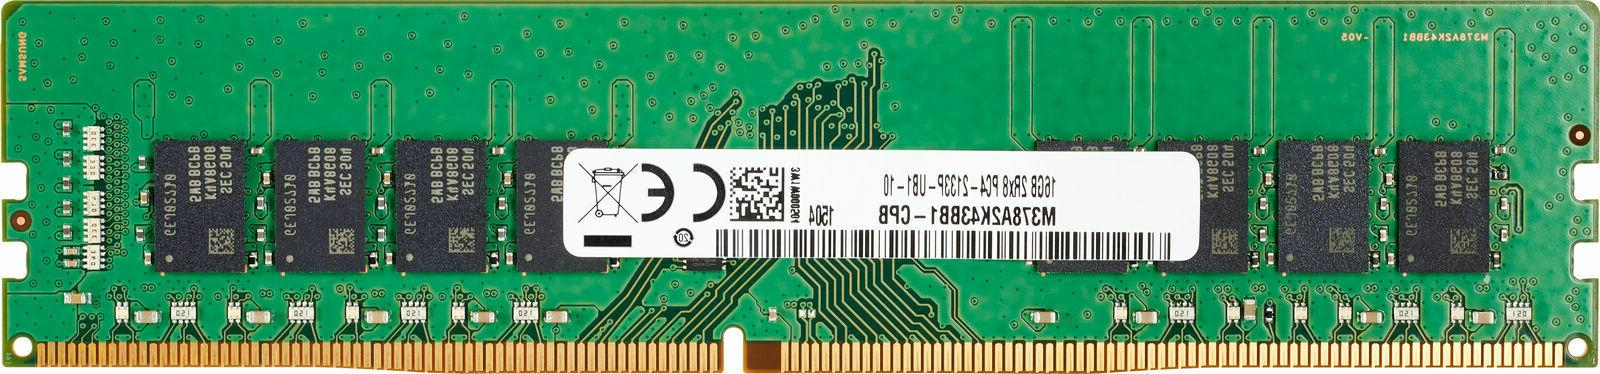 new original 8gb ecc udimm ddr4 2666